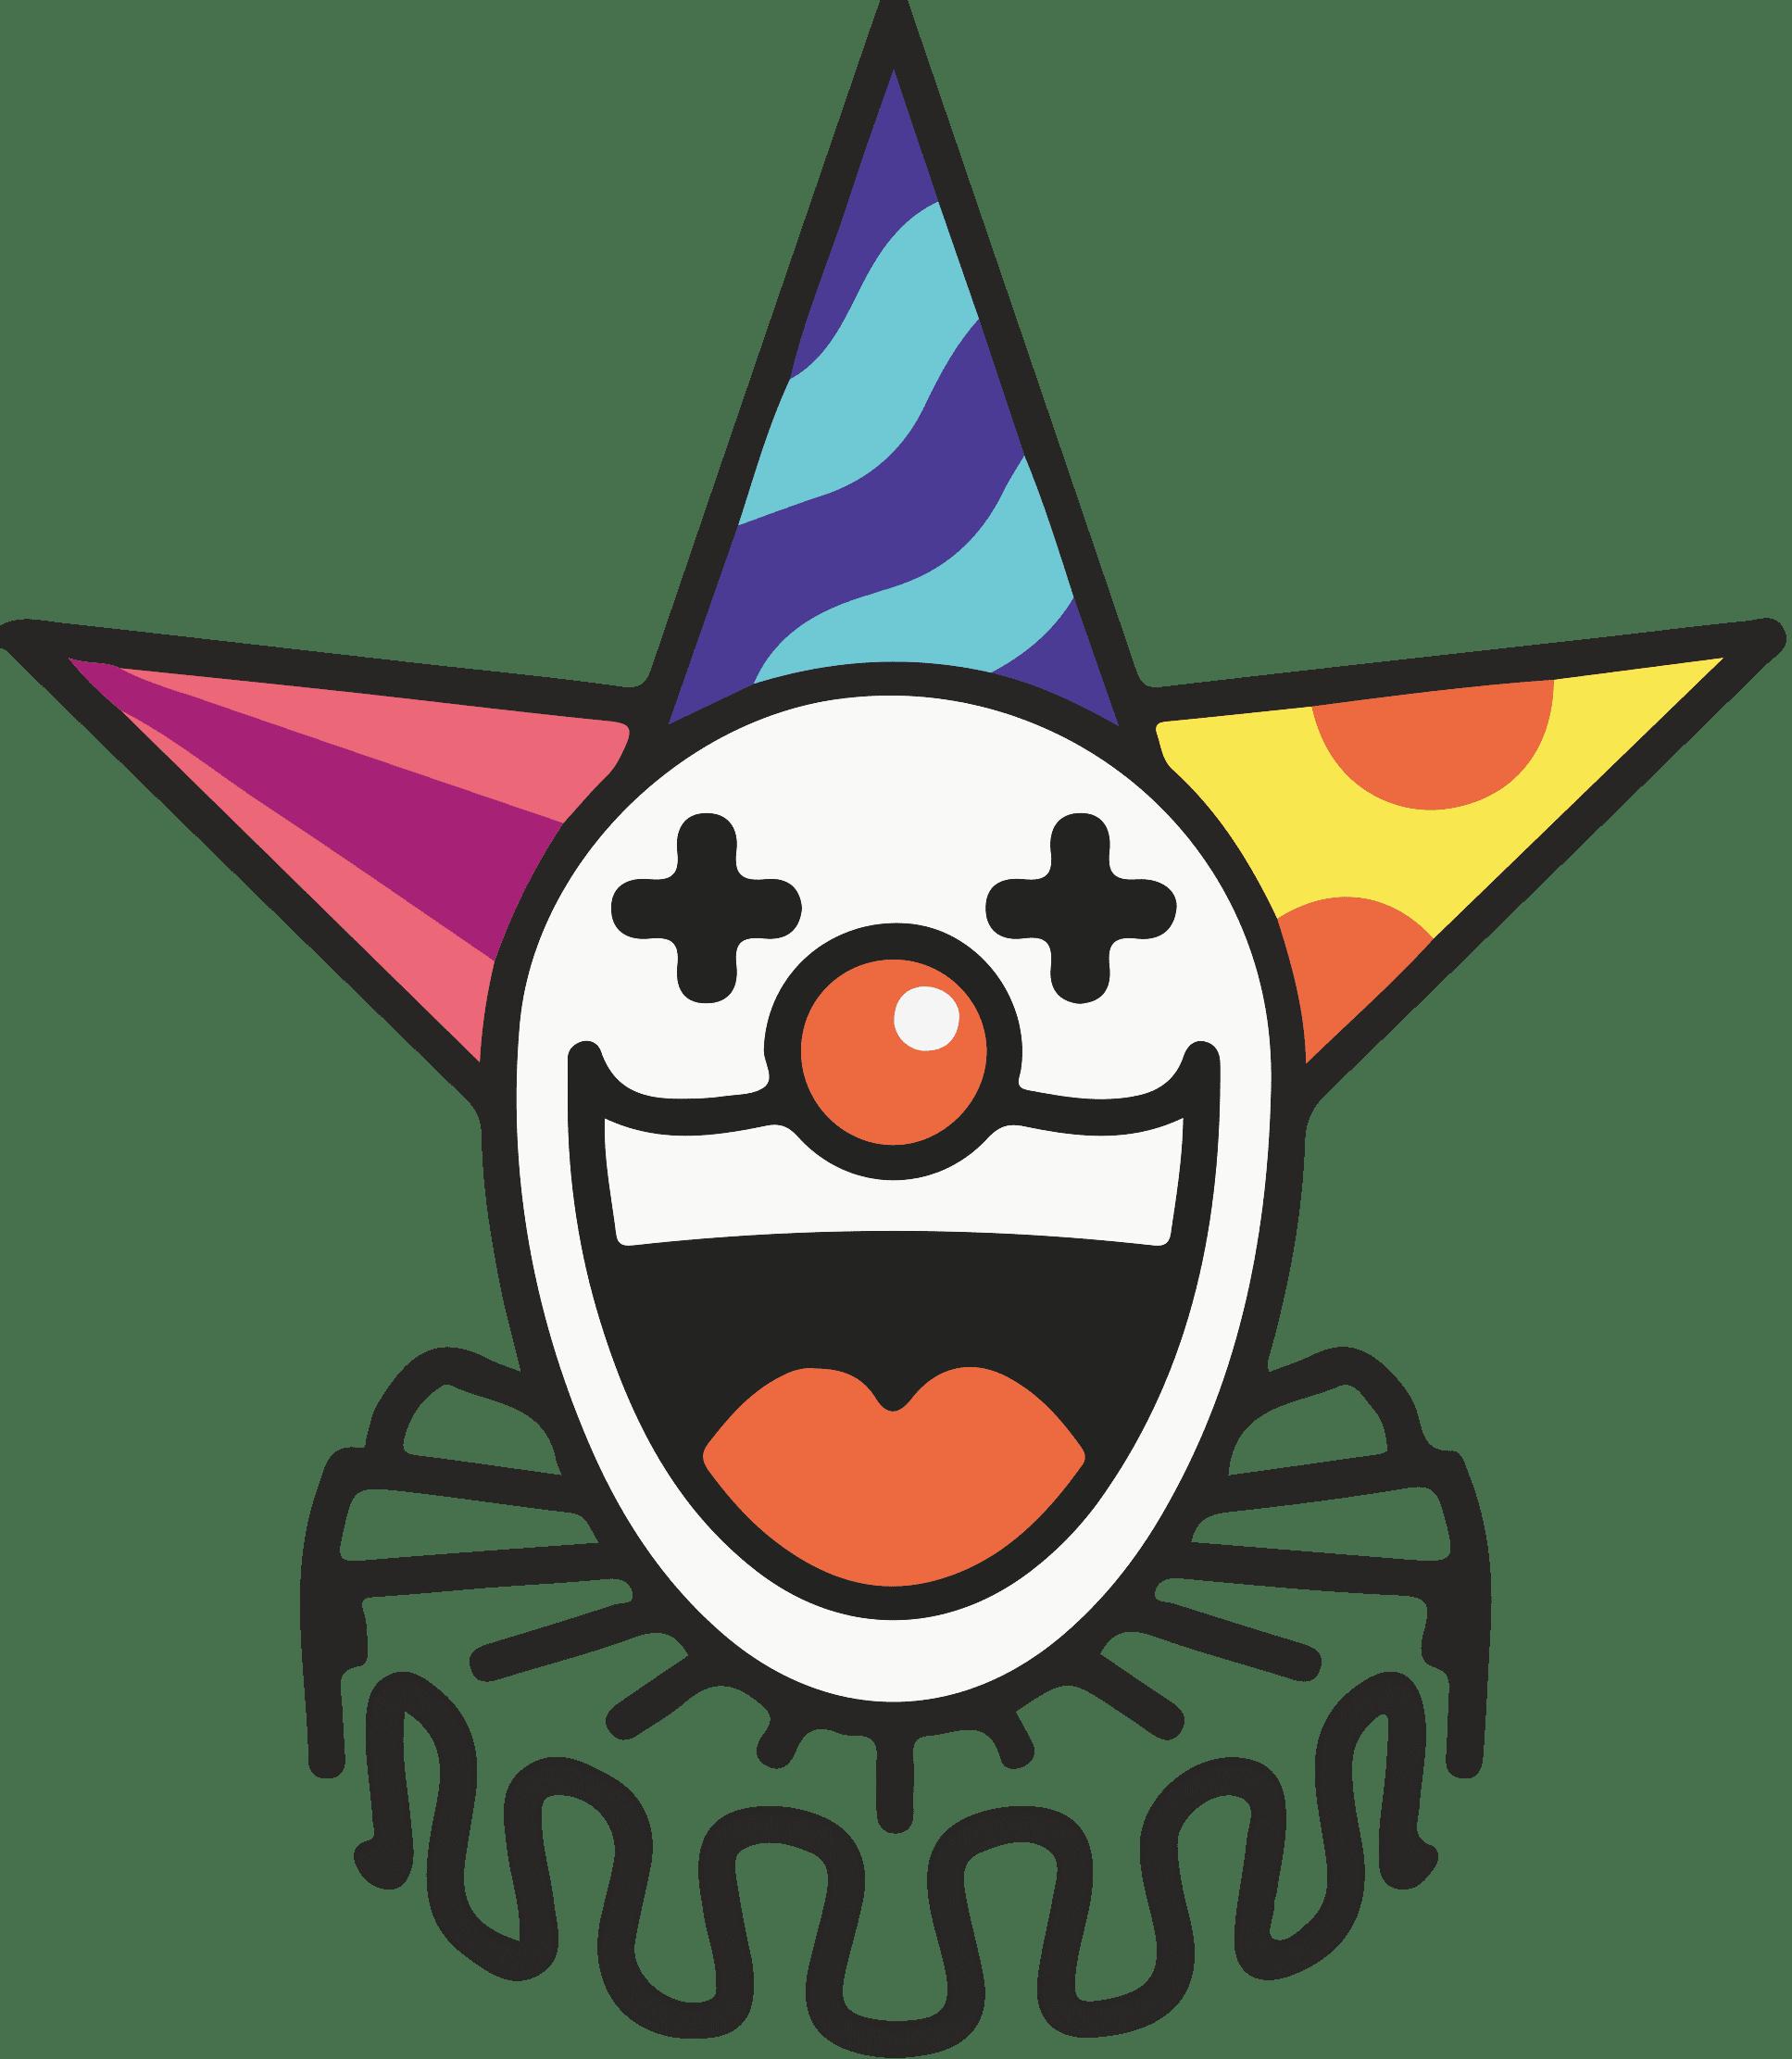 Szalony.pl - balony z helem, prezenty, upominki, pamiątki, sklep z balonami